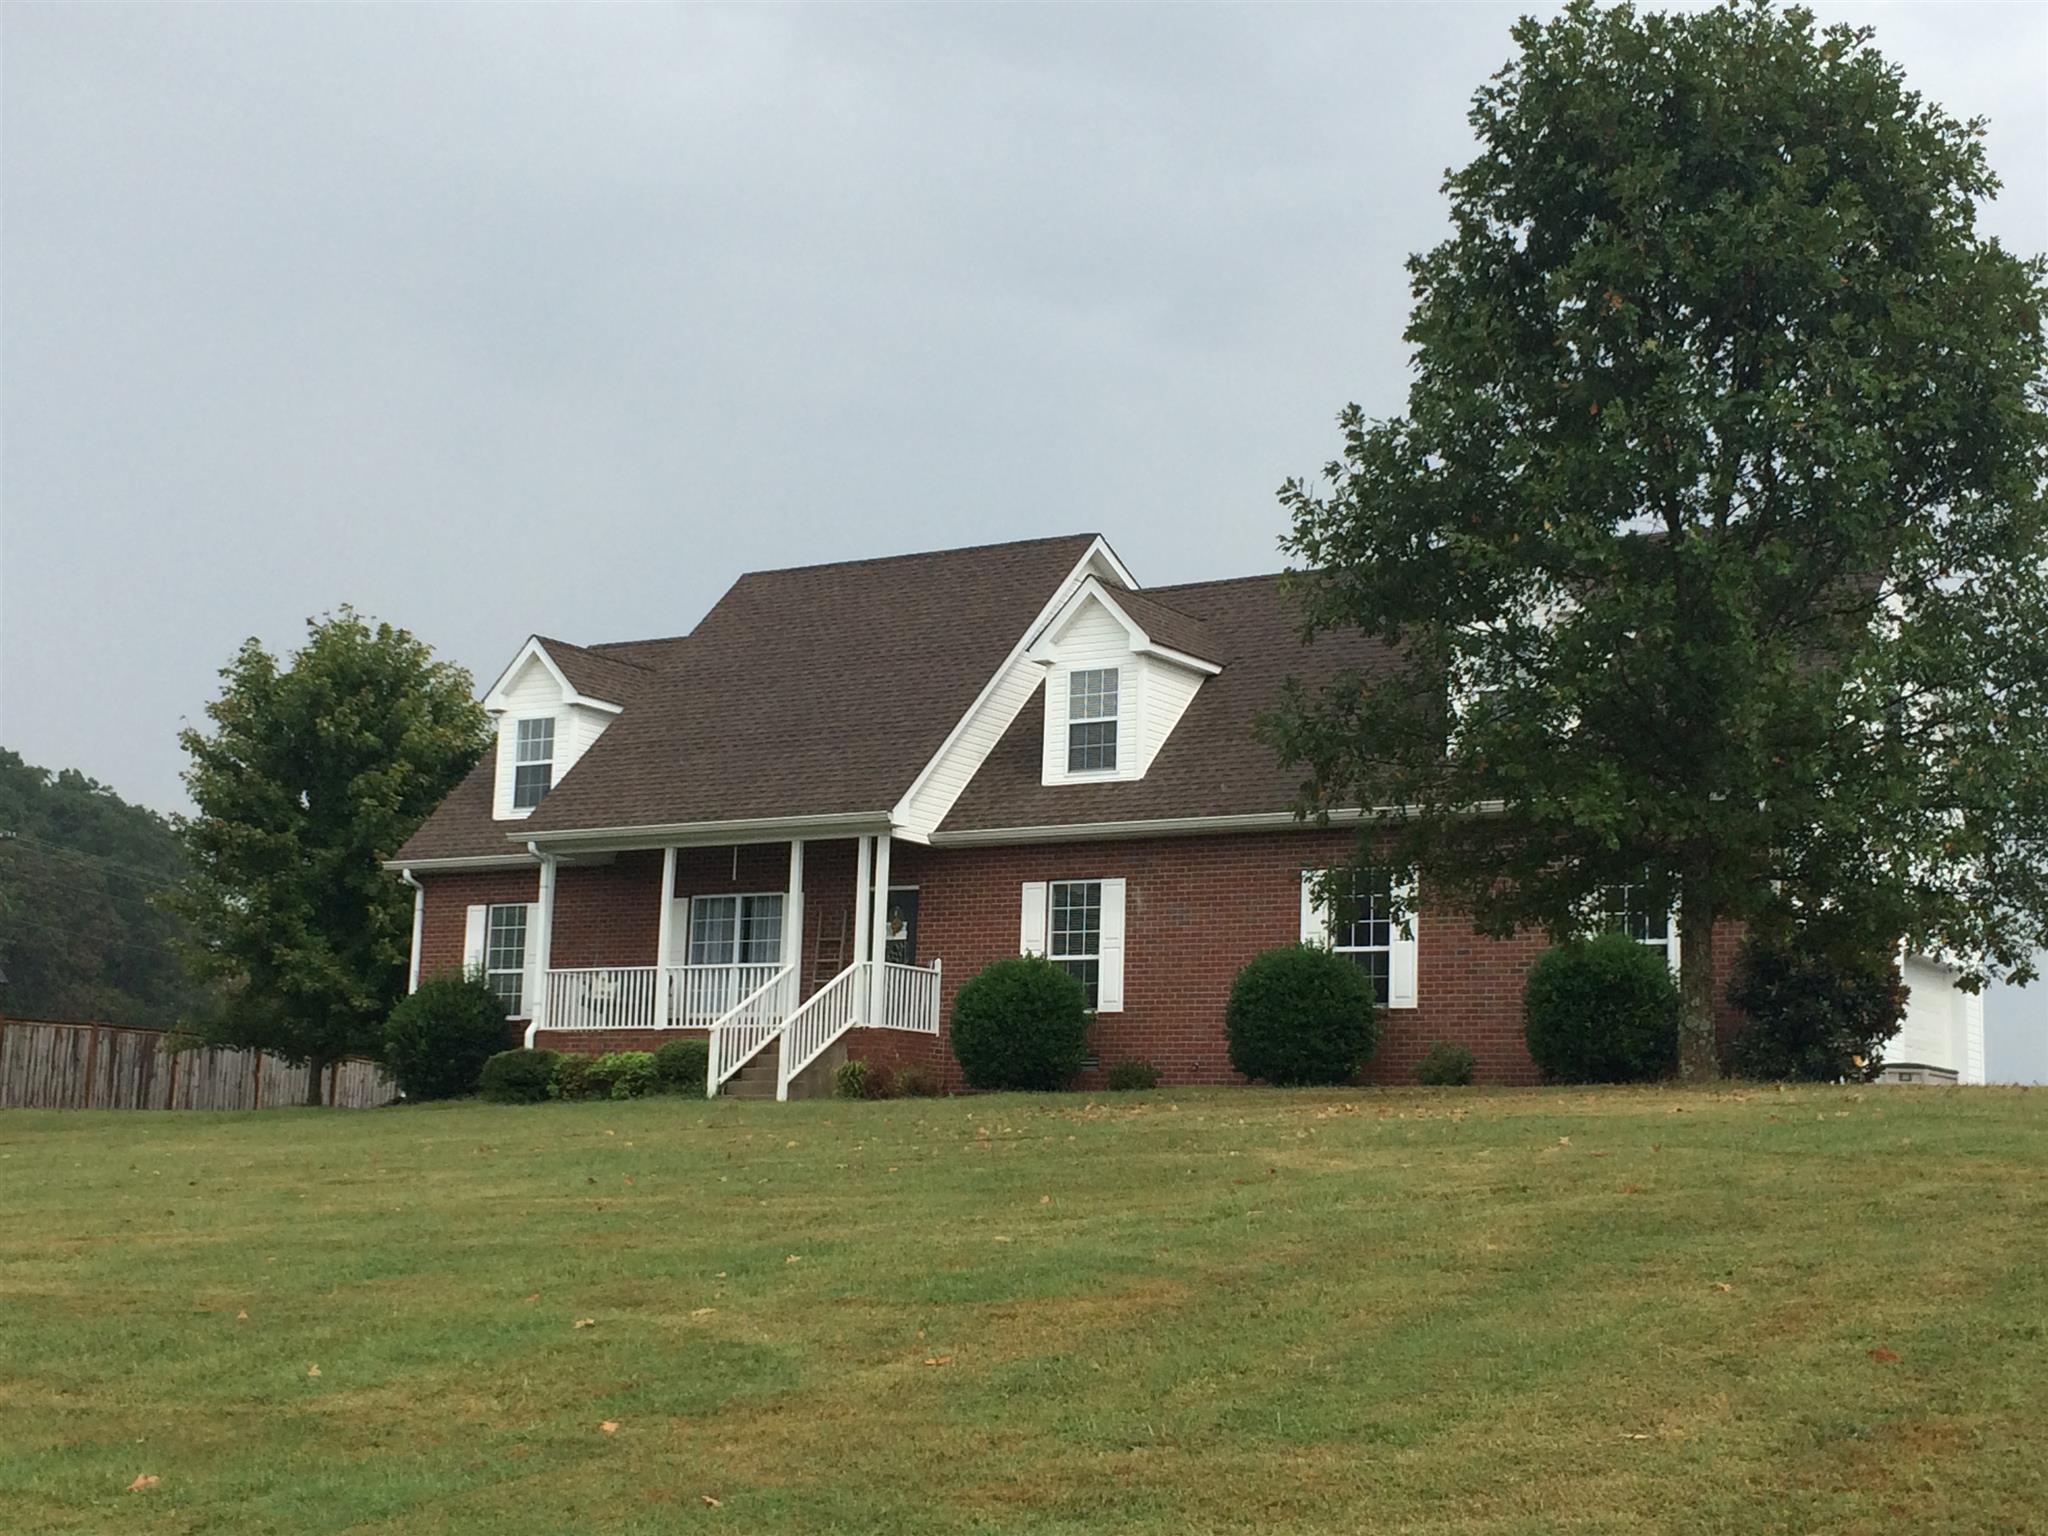 4421 Calista Rd, Cross Plains, TN 37049 - Cross Plains, TN real estate listing